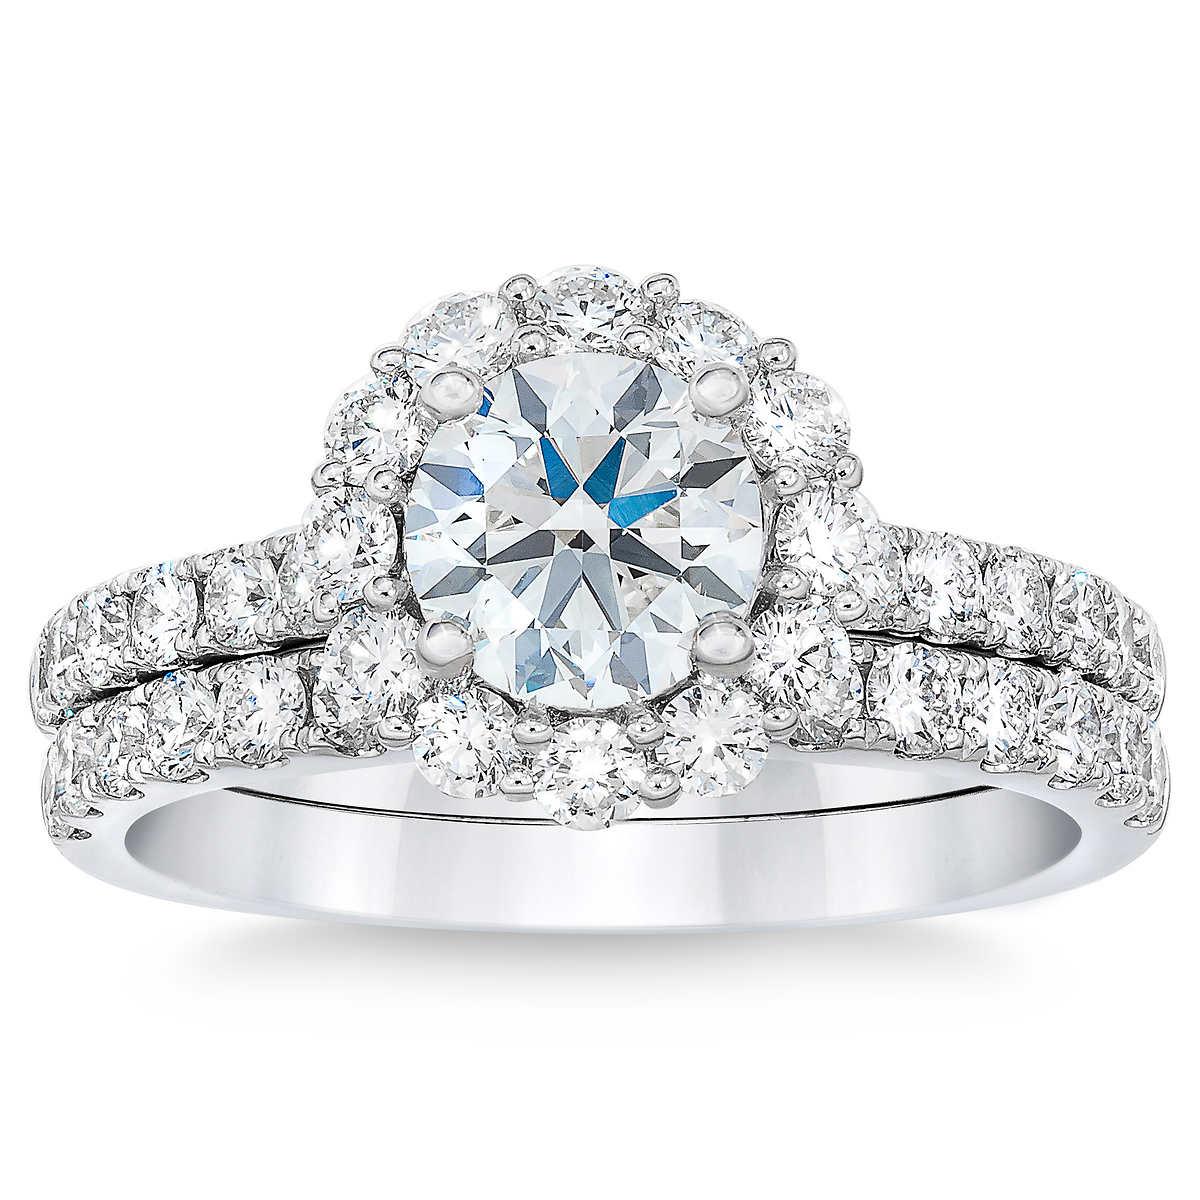 e6c7e4194b9 Round Brilliant 2.10 ctw VS2 Clarity, I Color Diamond Platinum Wedding Set